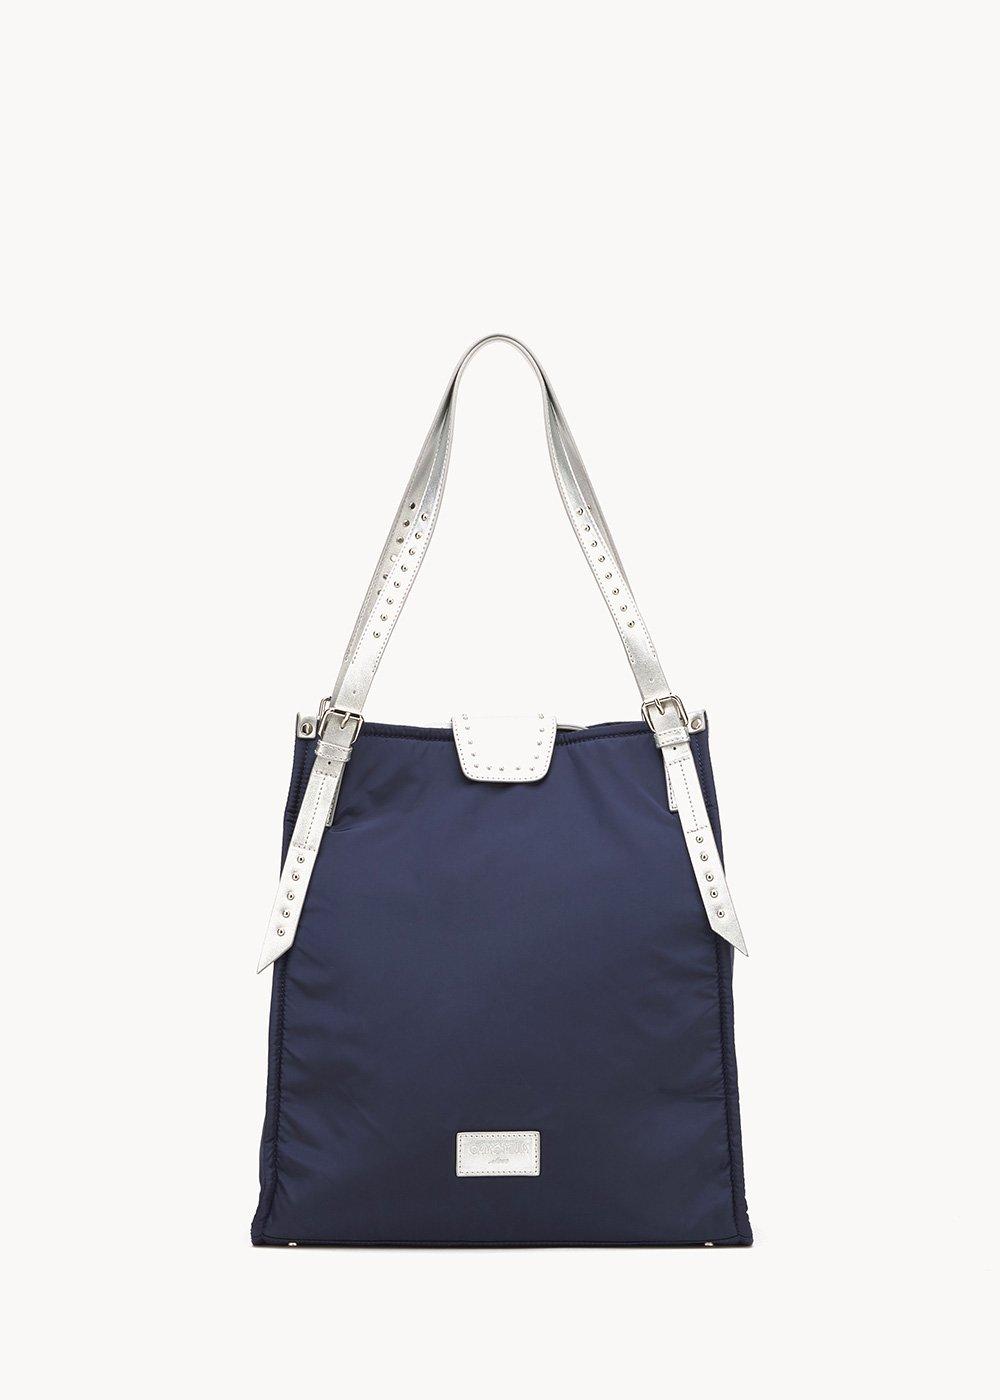 Nylon shopping bag with contrasting handles - Medium Blue / Silver - Woman